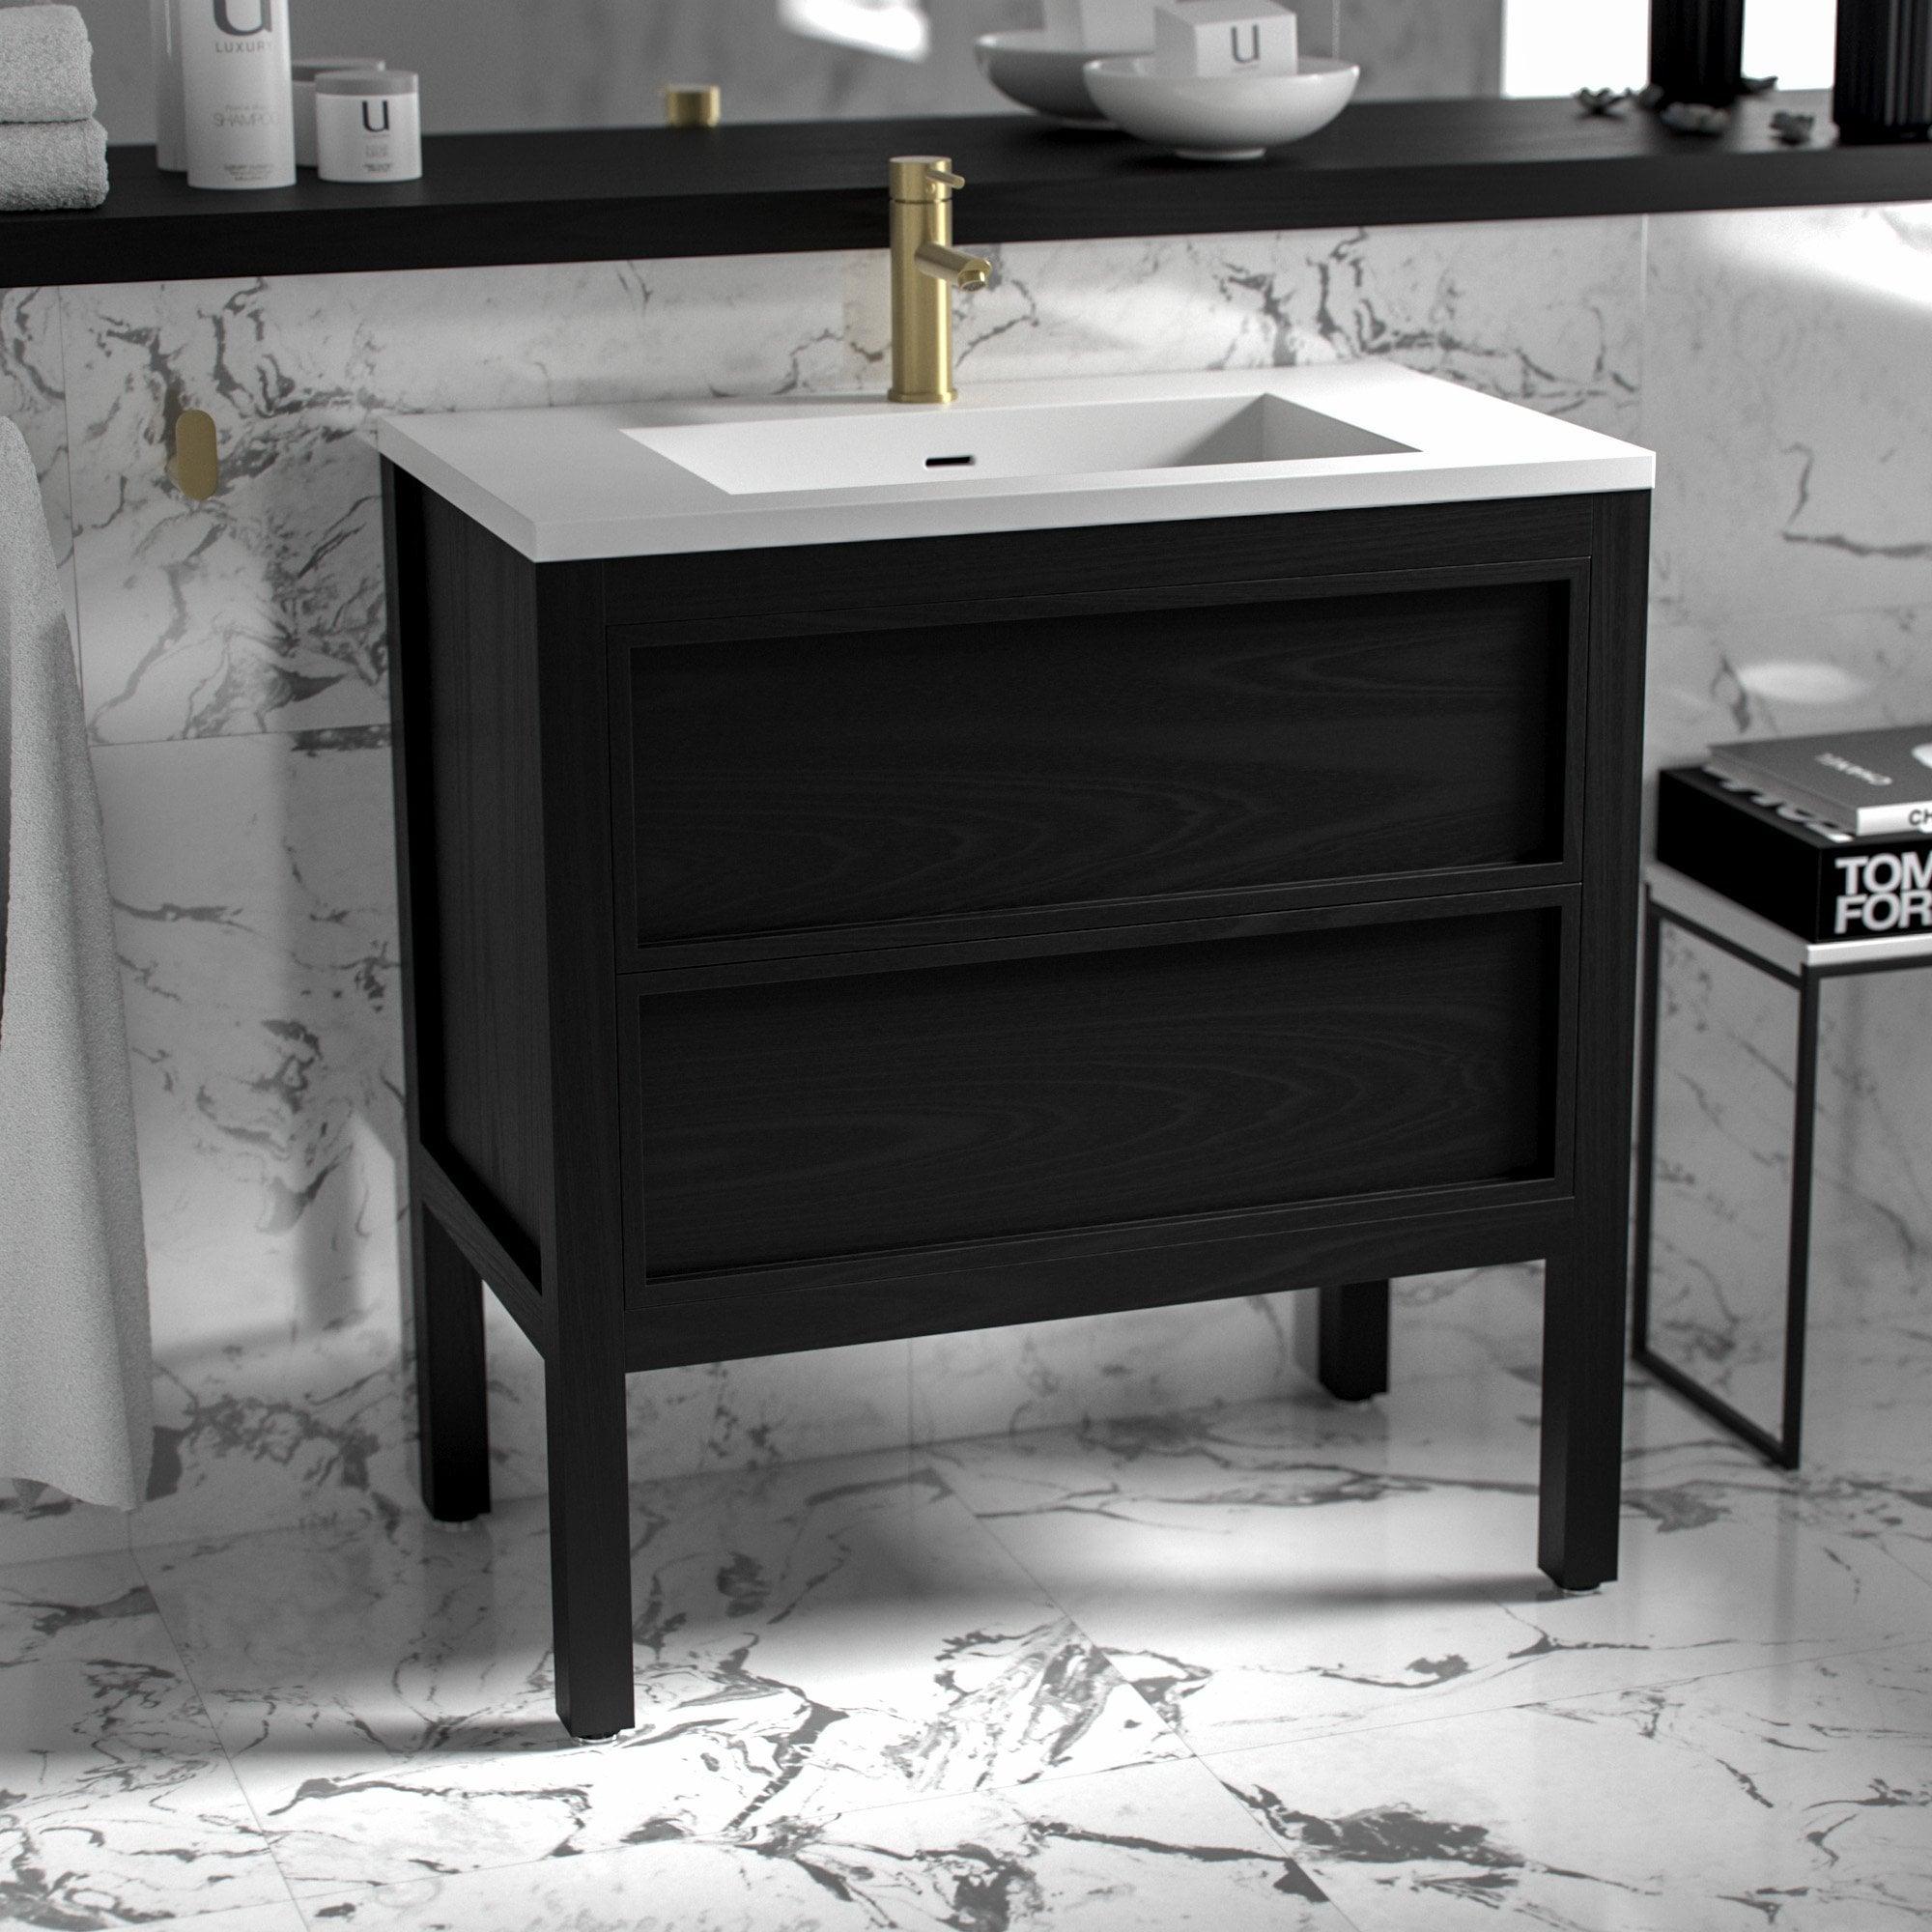 Lusso Stone Claridge Black Bathroom Freestanding Vanity Unit 800